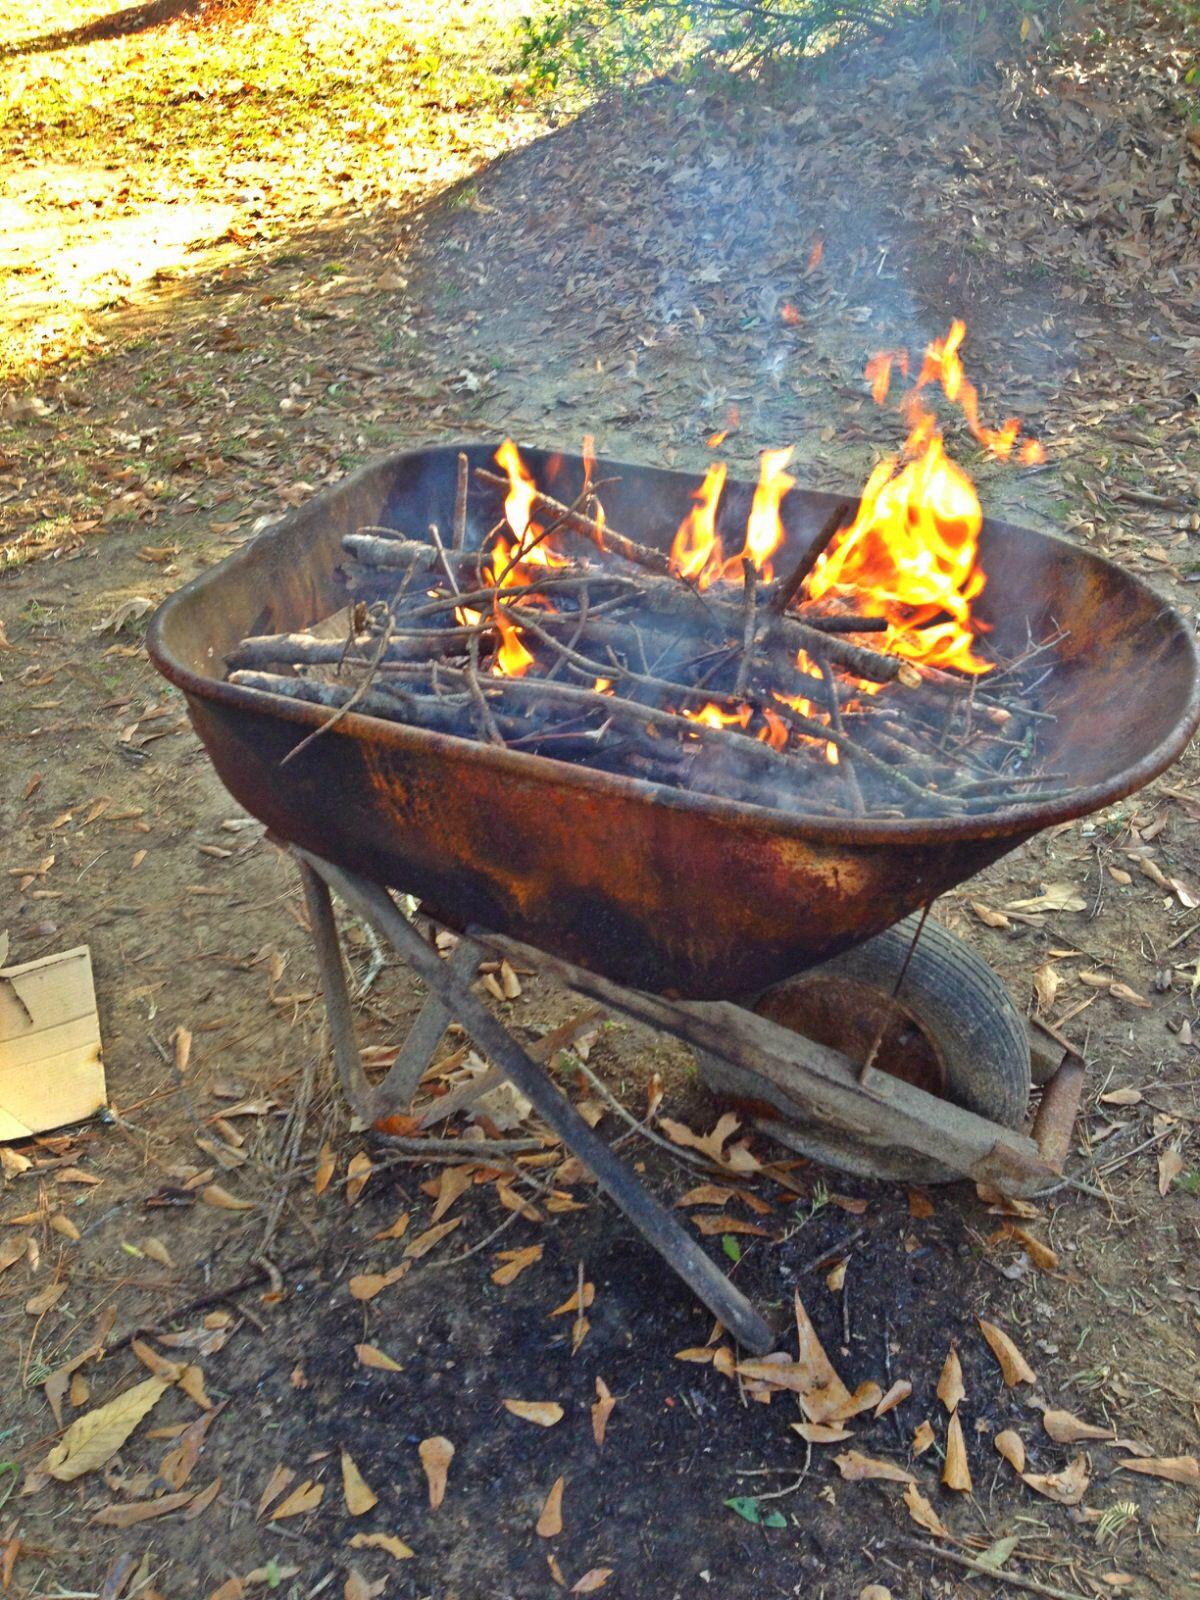 Wheelbarrow Fire Pit Fire Pit Outdoor Fire Pit Outdoor Fire